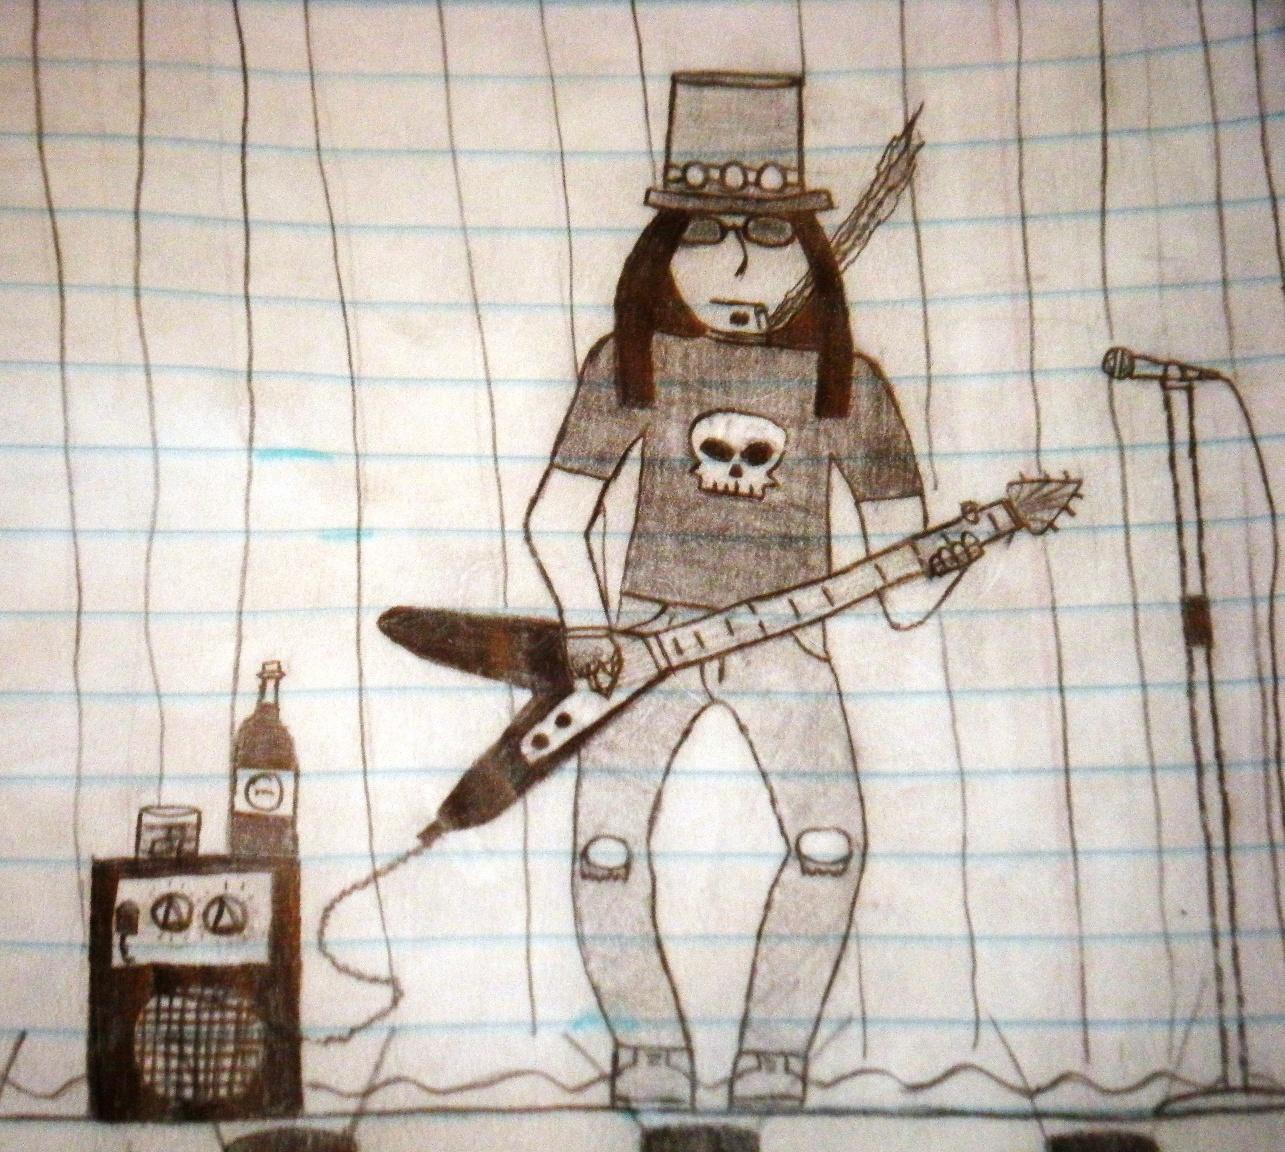 The Lone Guitarist